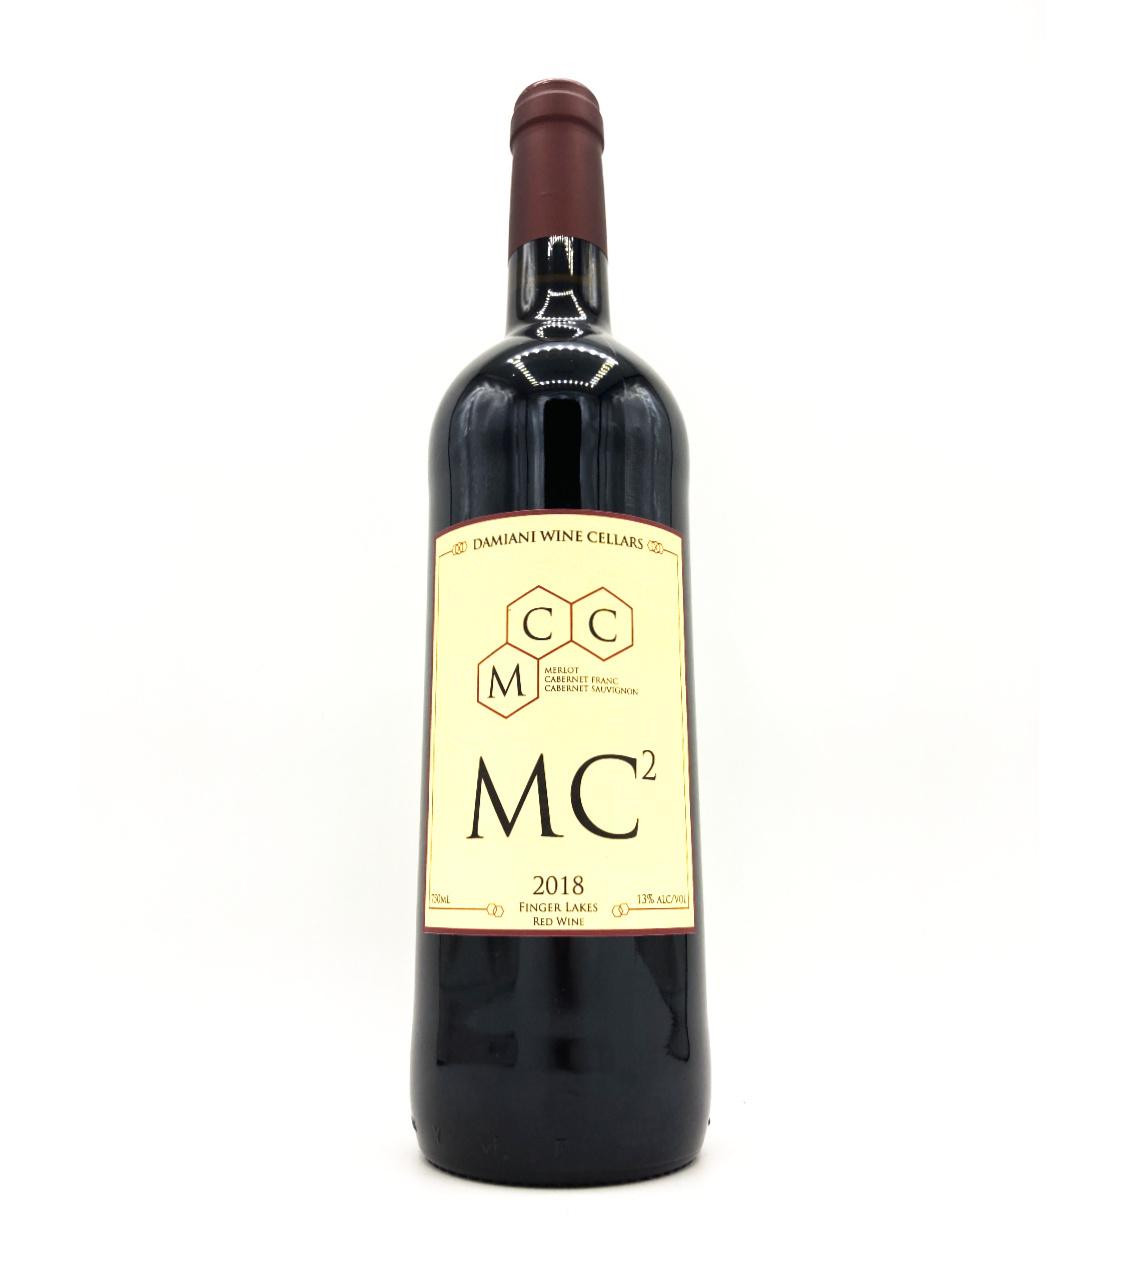 Bordeaux Blend MC22019 Damiani